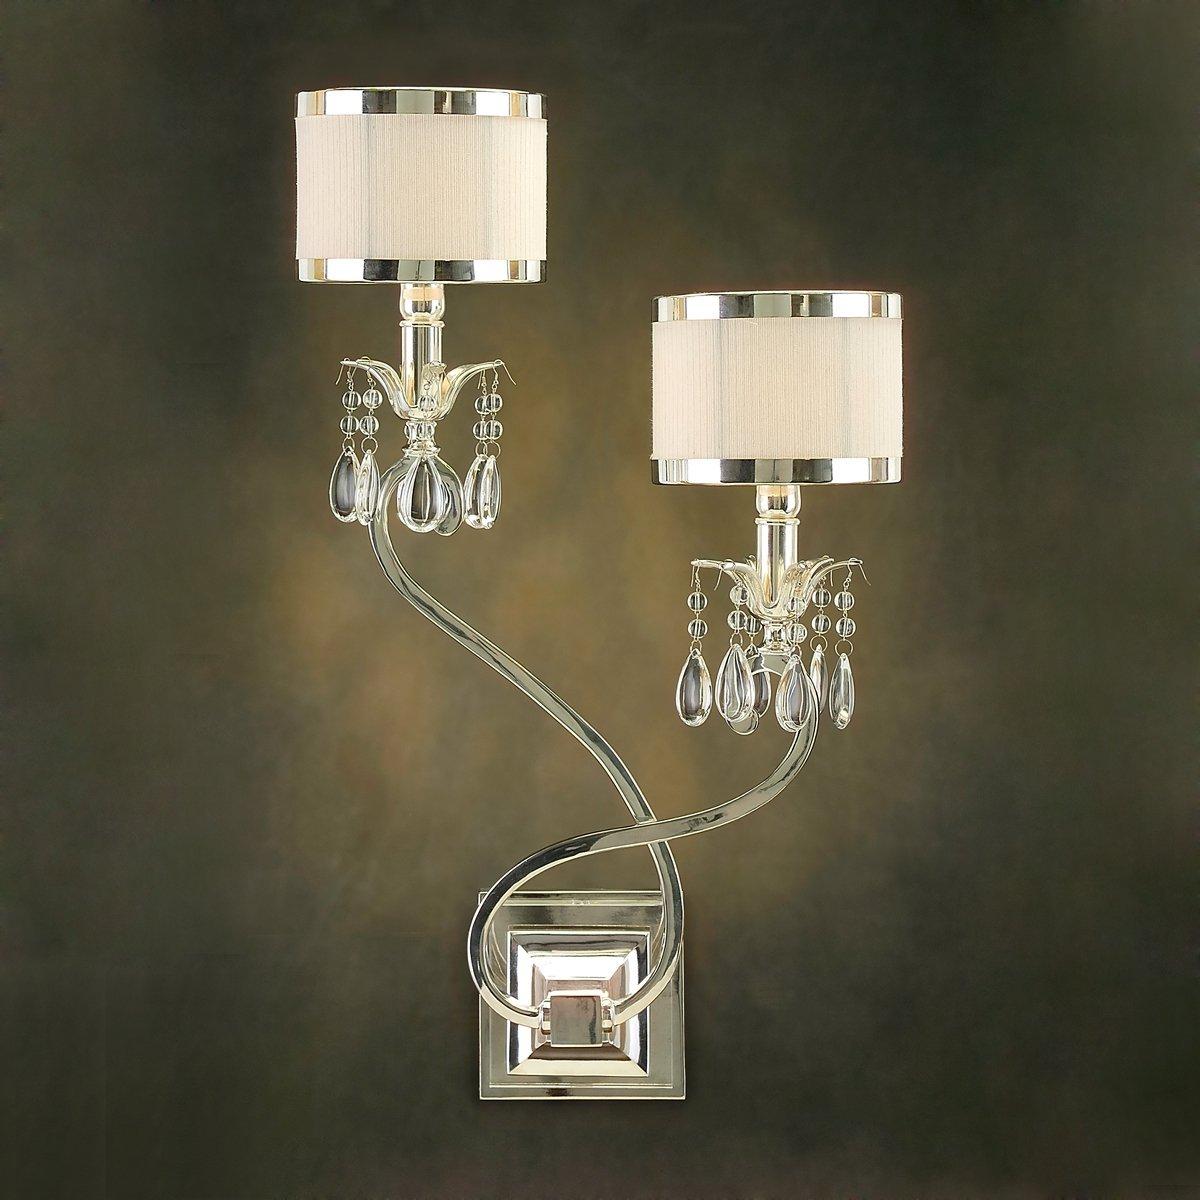 ROSE WOOD FURNITURE: Modern Lamps